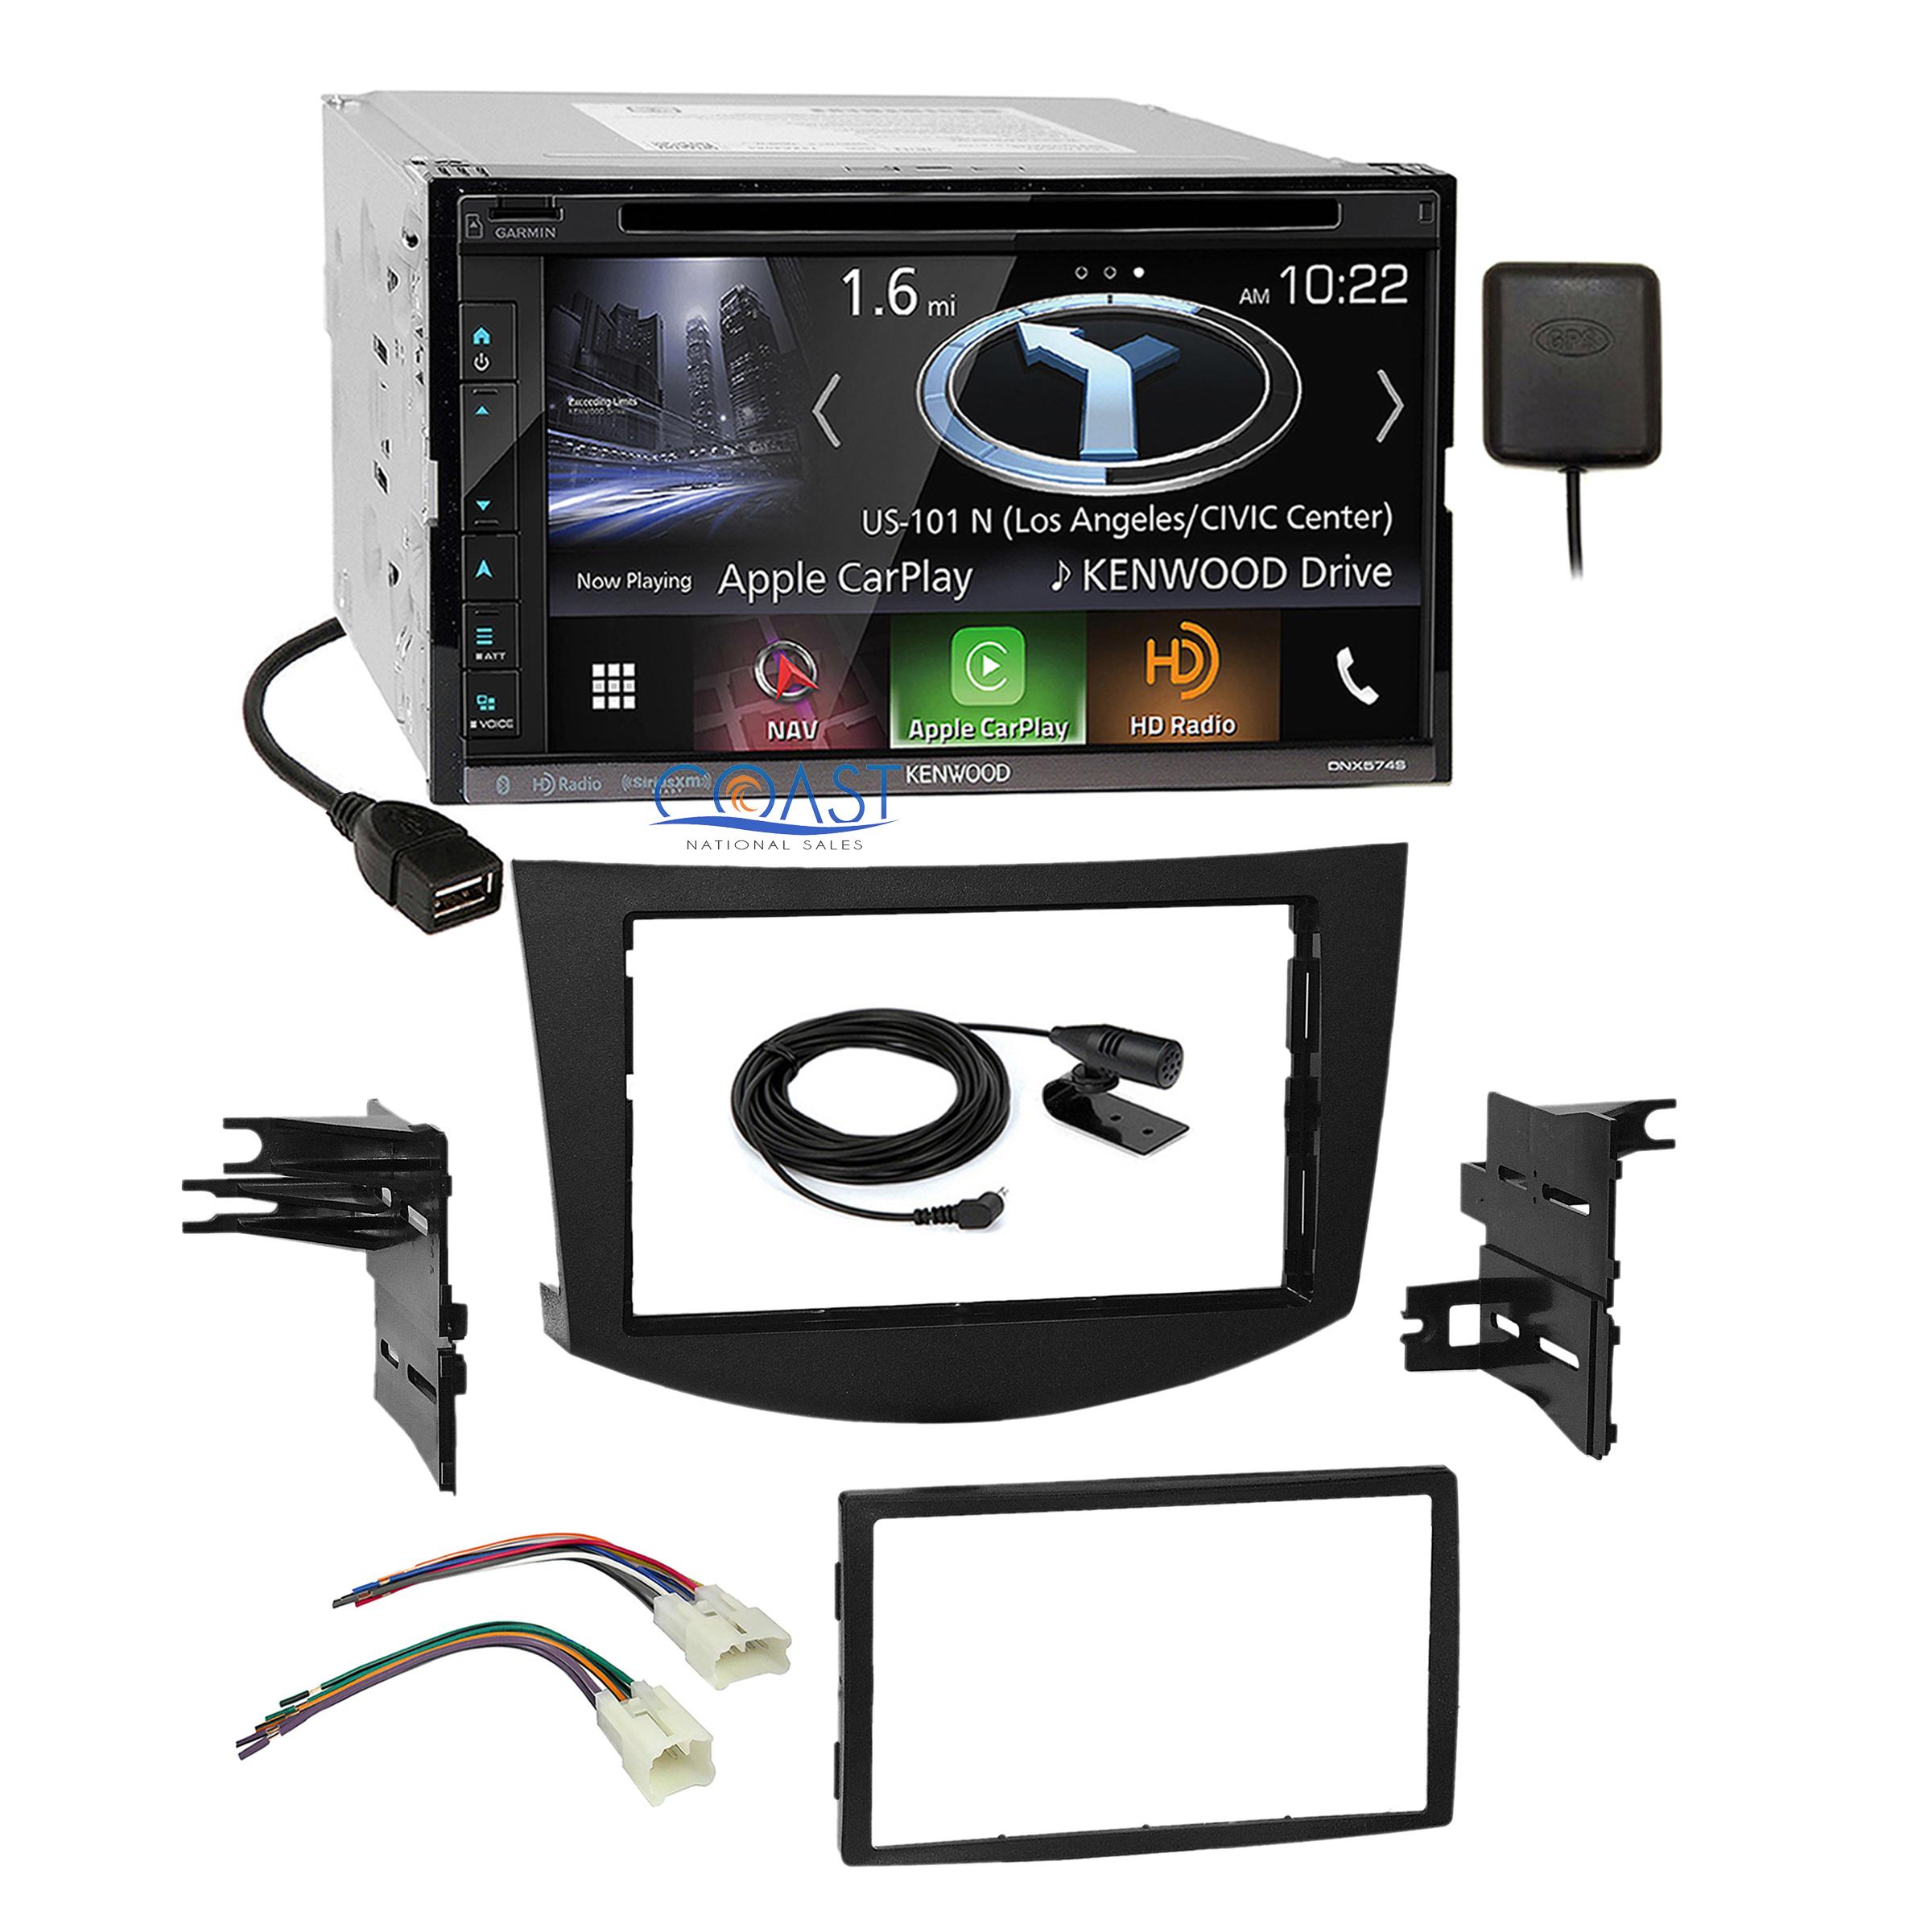 Details about Kenwood GPS Carplay Bluetooth Stereo Dash Kit Harness on kenwood instruction manual, kenwood ddx6019, kenwood power supply, kenwood remote control, kenwood wiring-diagram,